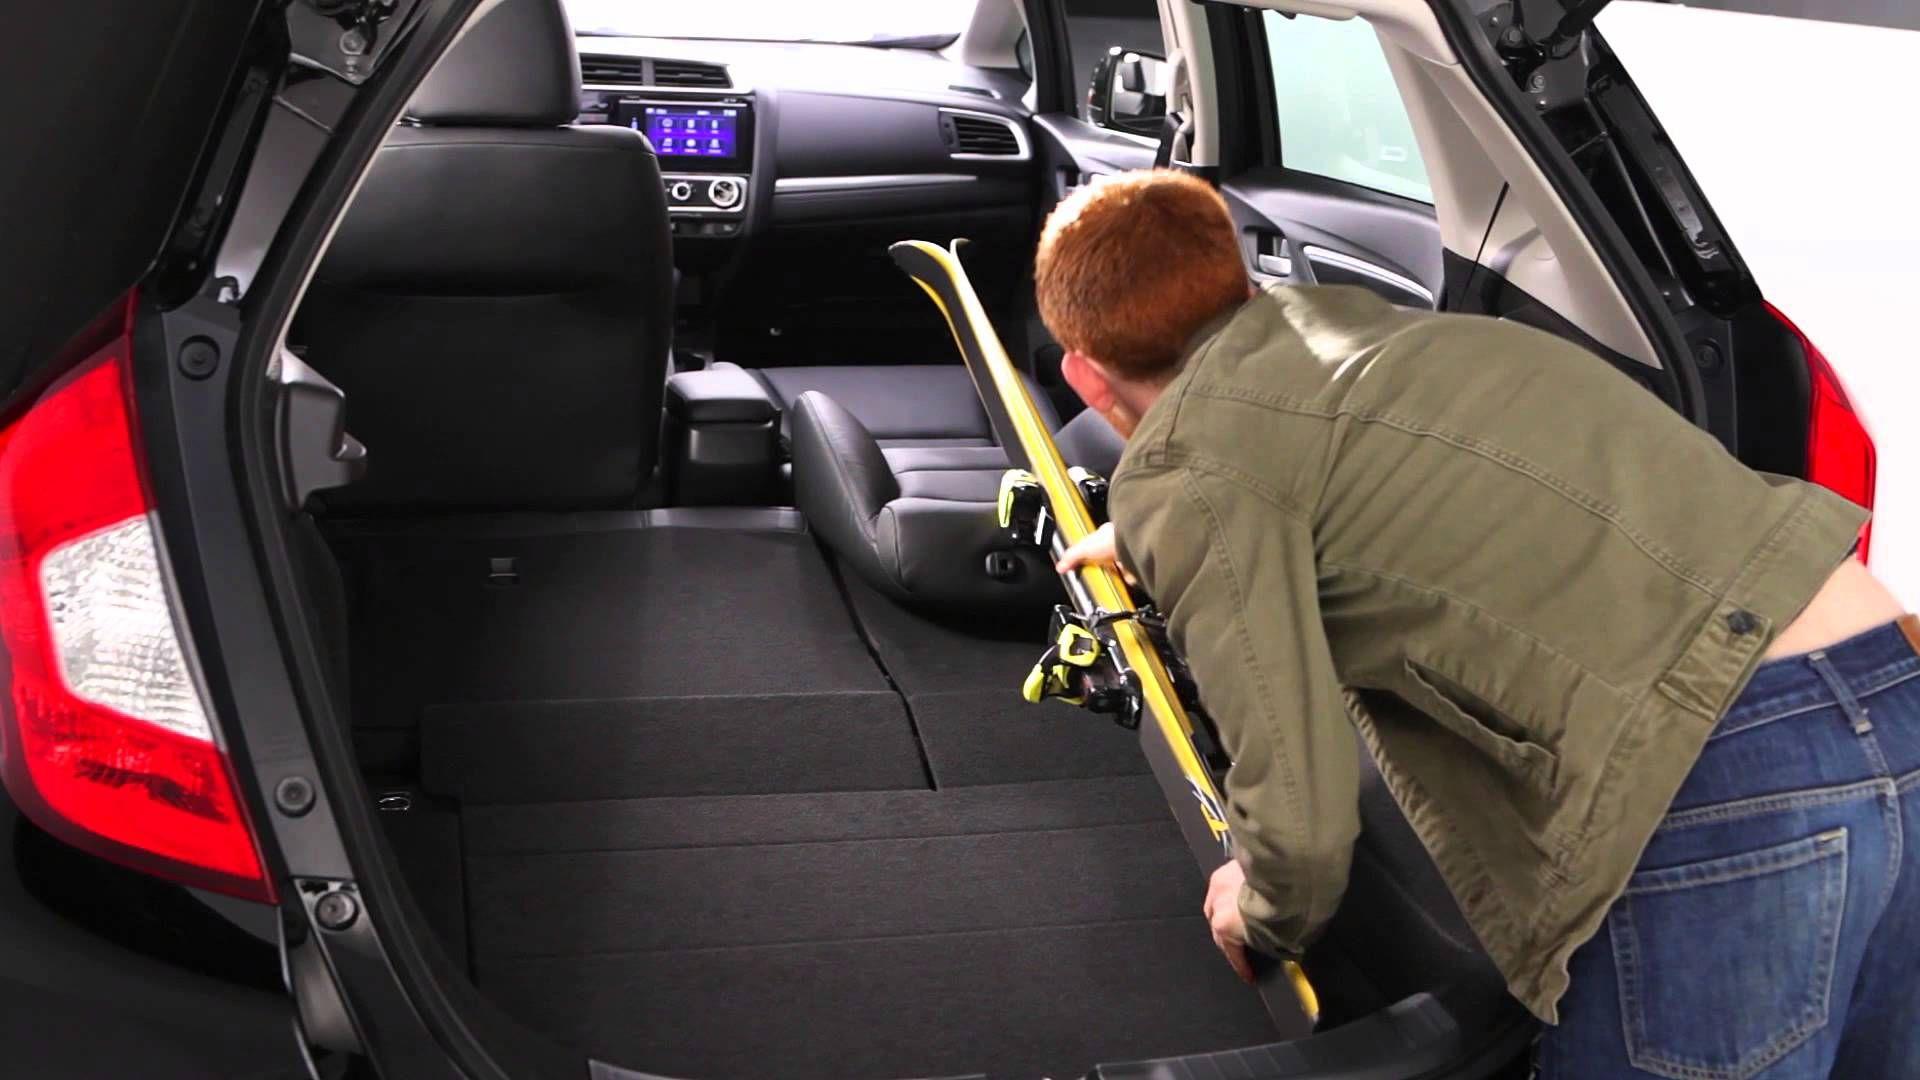 2015 Honda Jazz Fit Interior Cargo Space Honda Jazz Honda Jazz